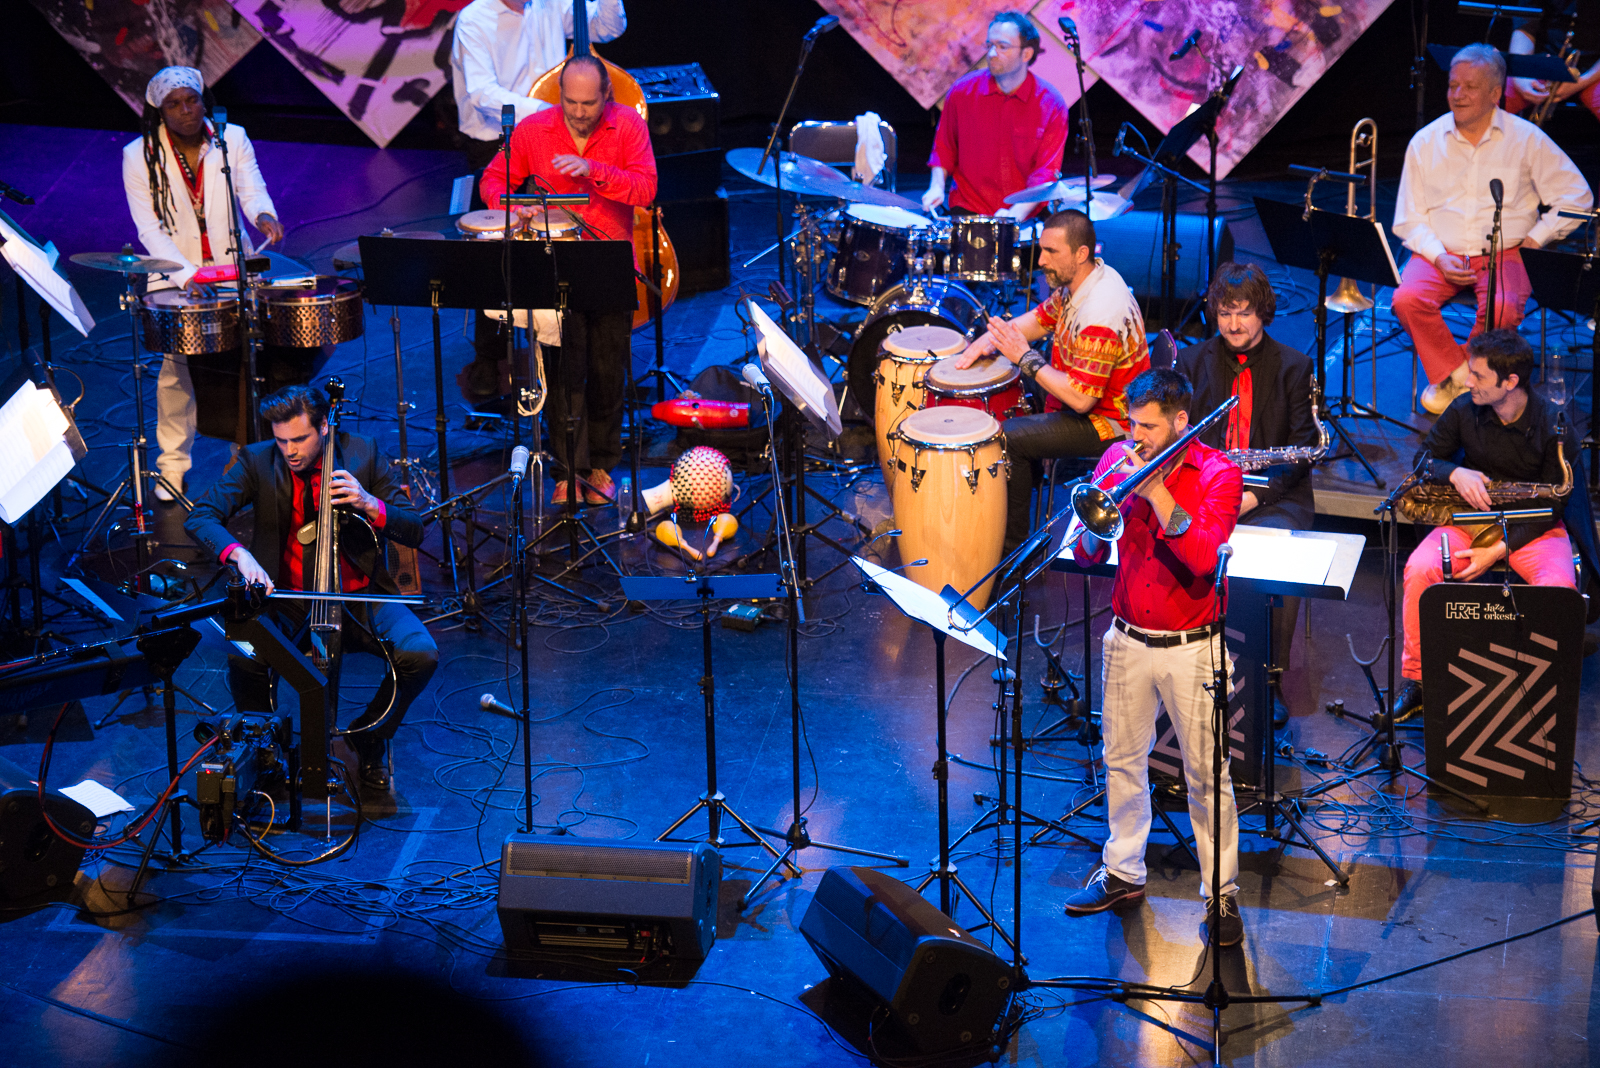 Jazz orkestar HRT - a za VALENTINOVO I SALSA PARTY za karneval u ZADRU!